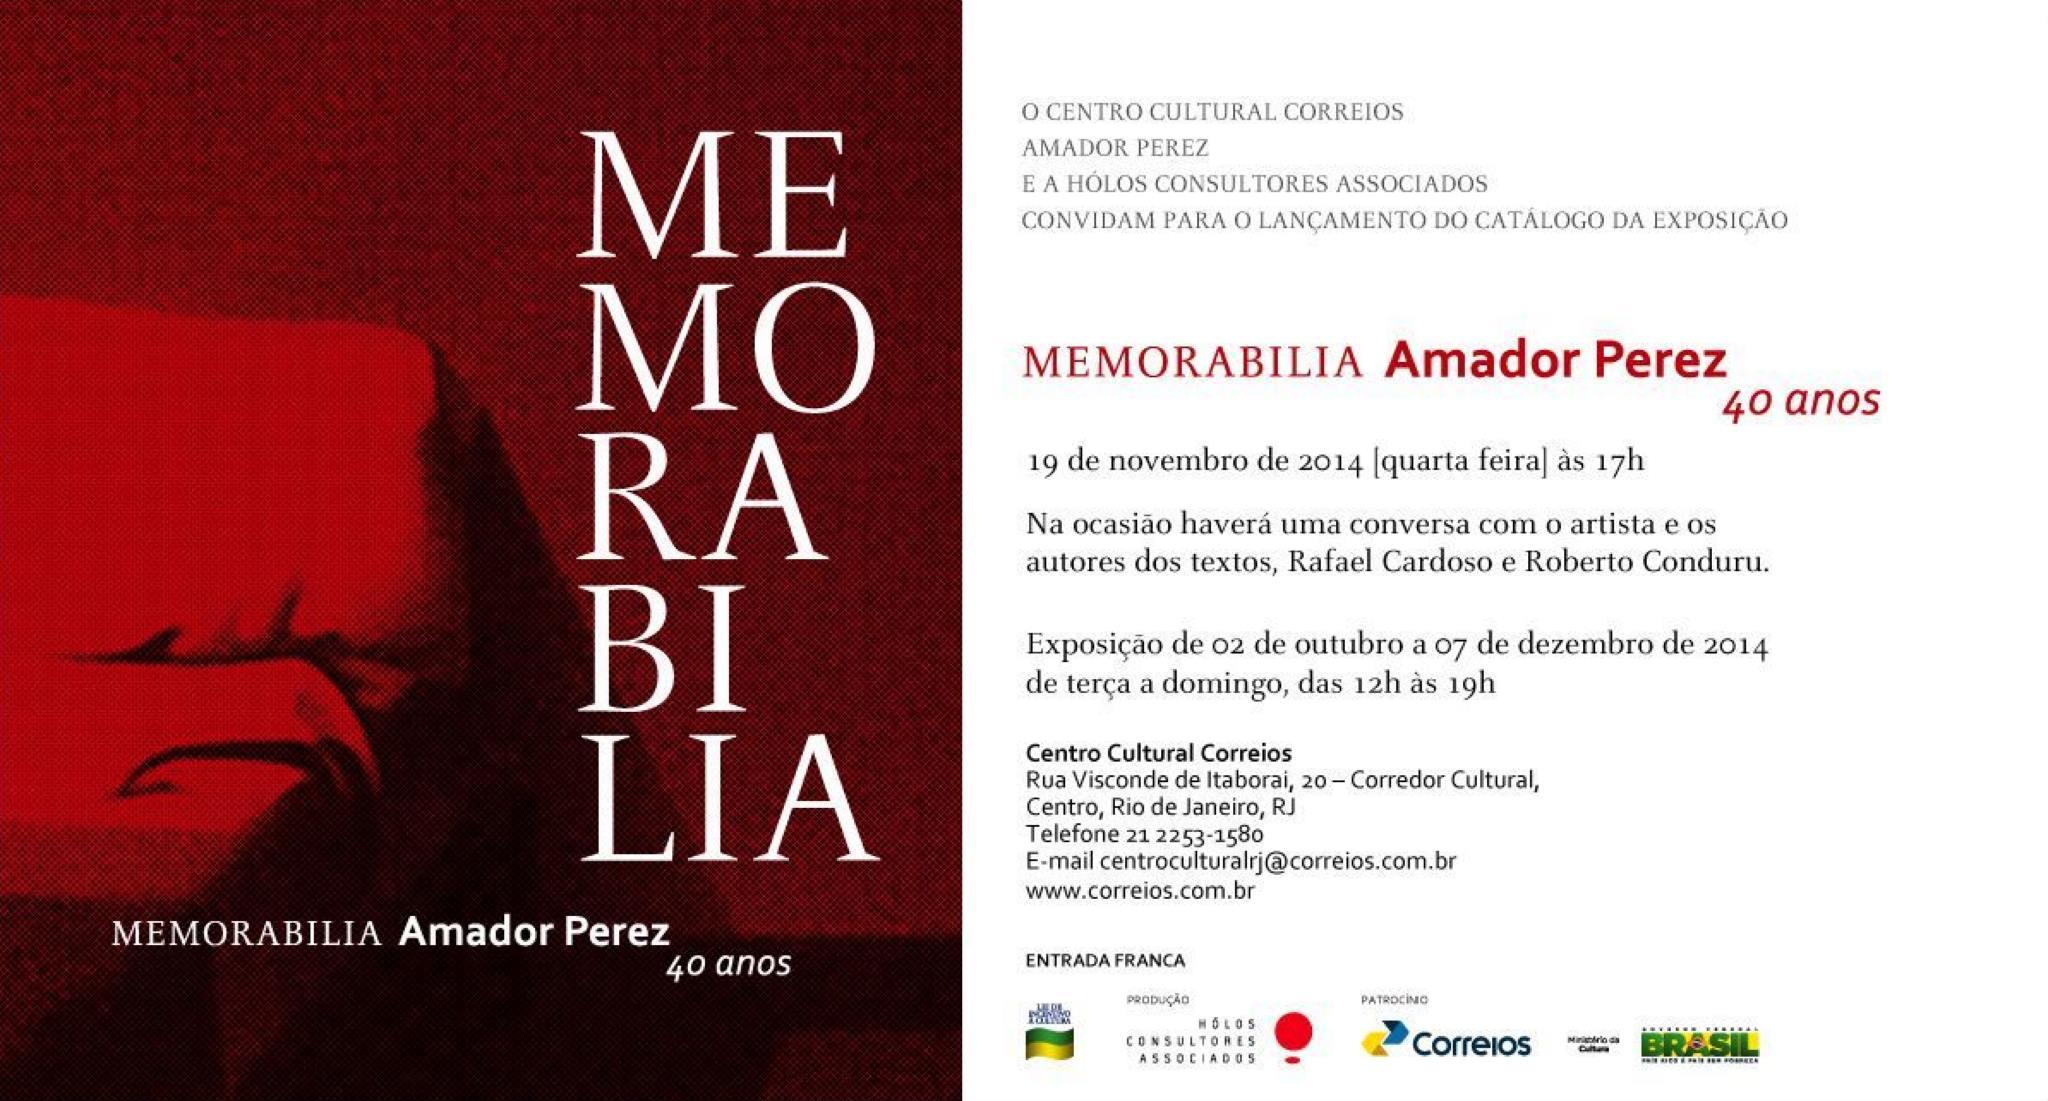 MemorabiliaAmadorPerez.jpg